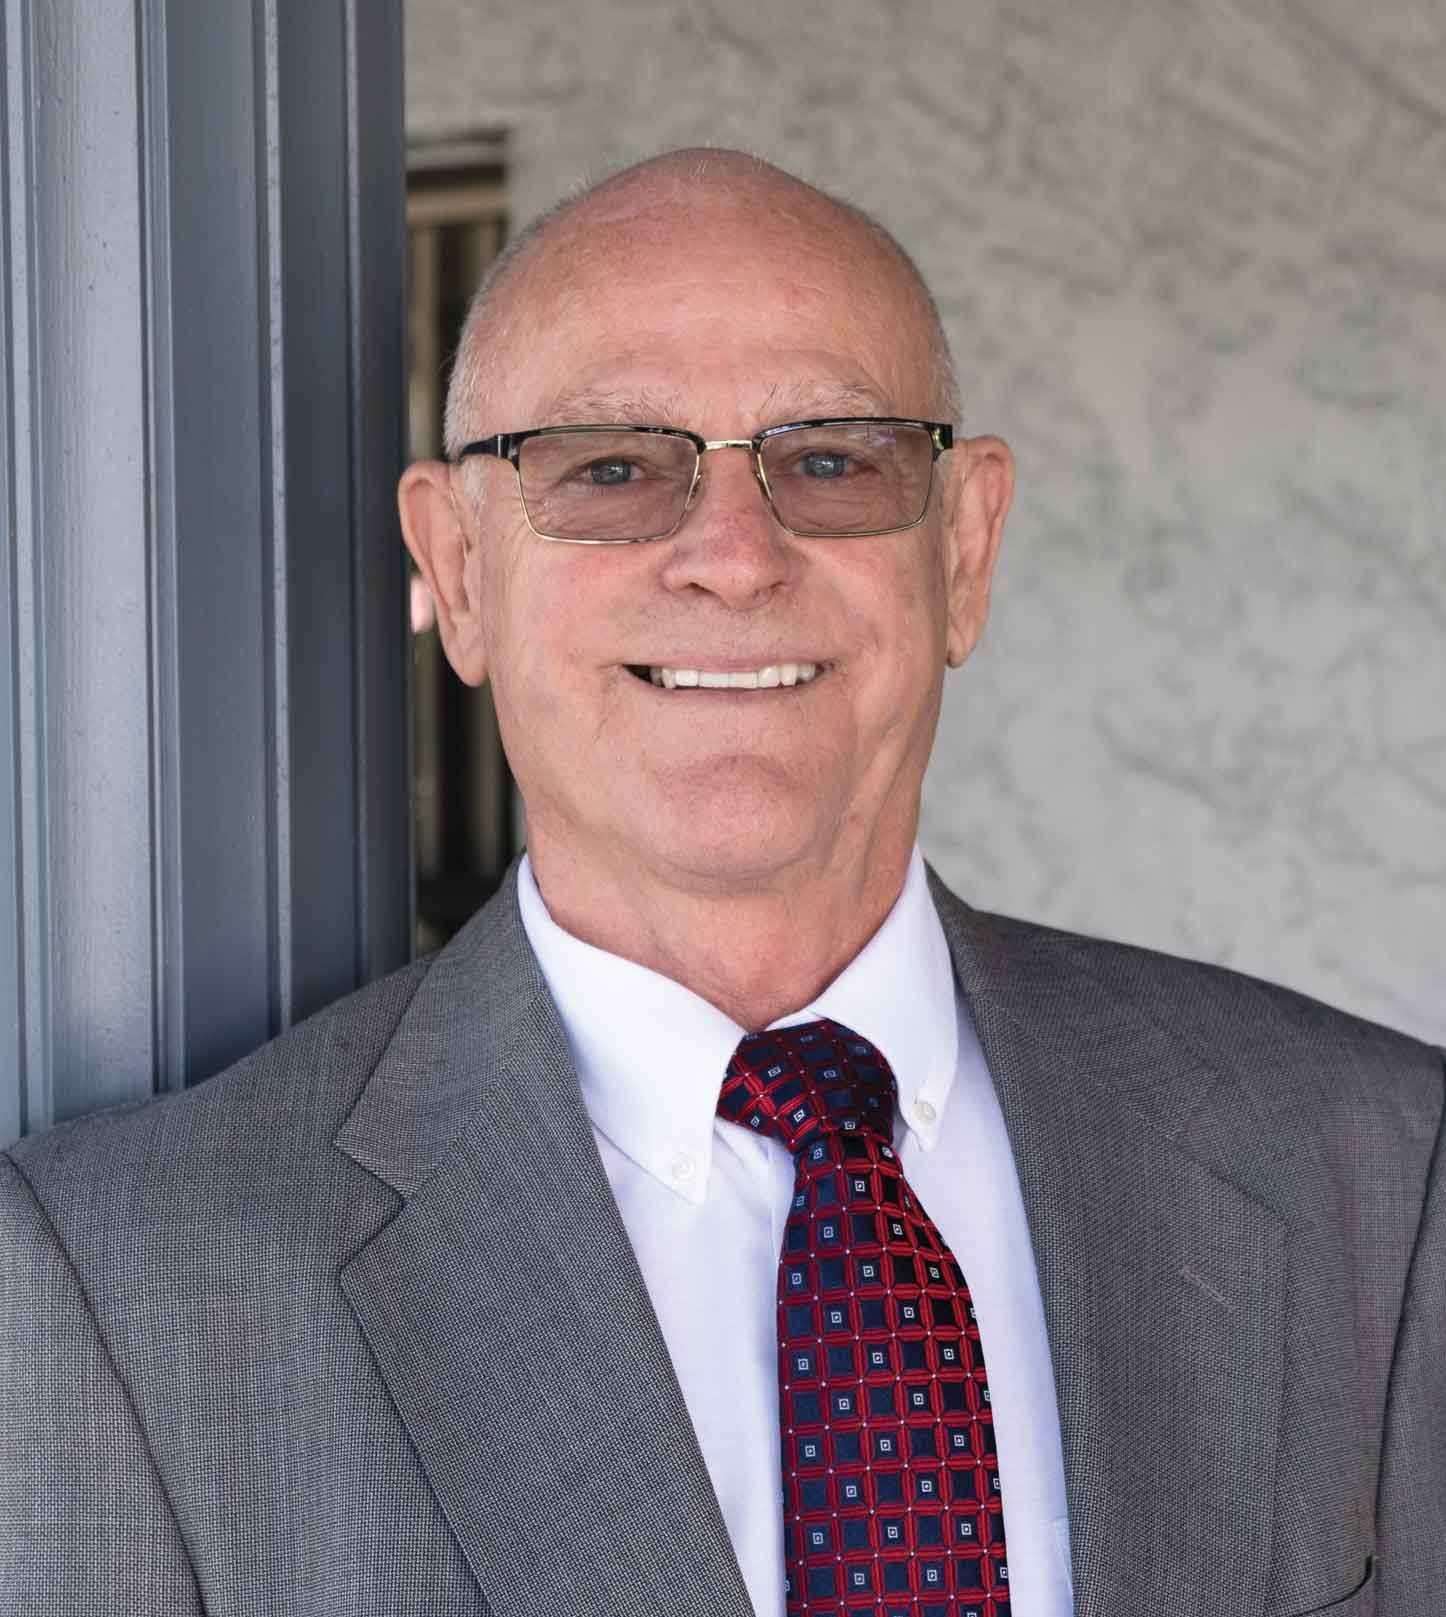 Randall Doell